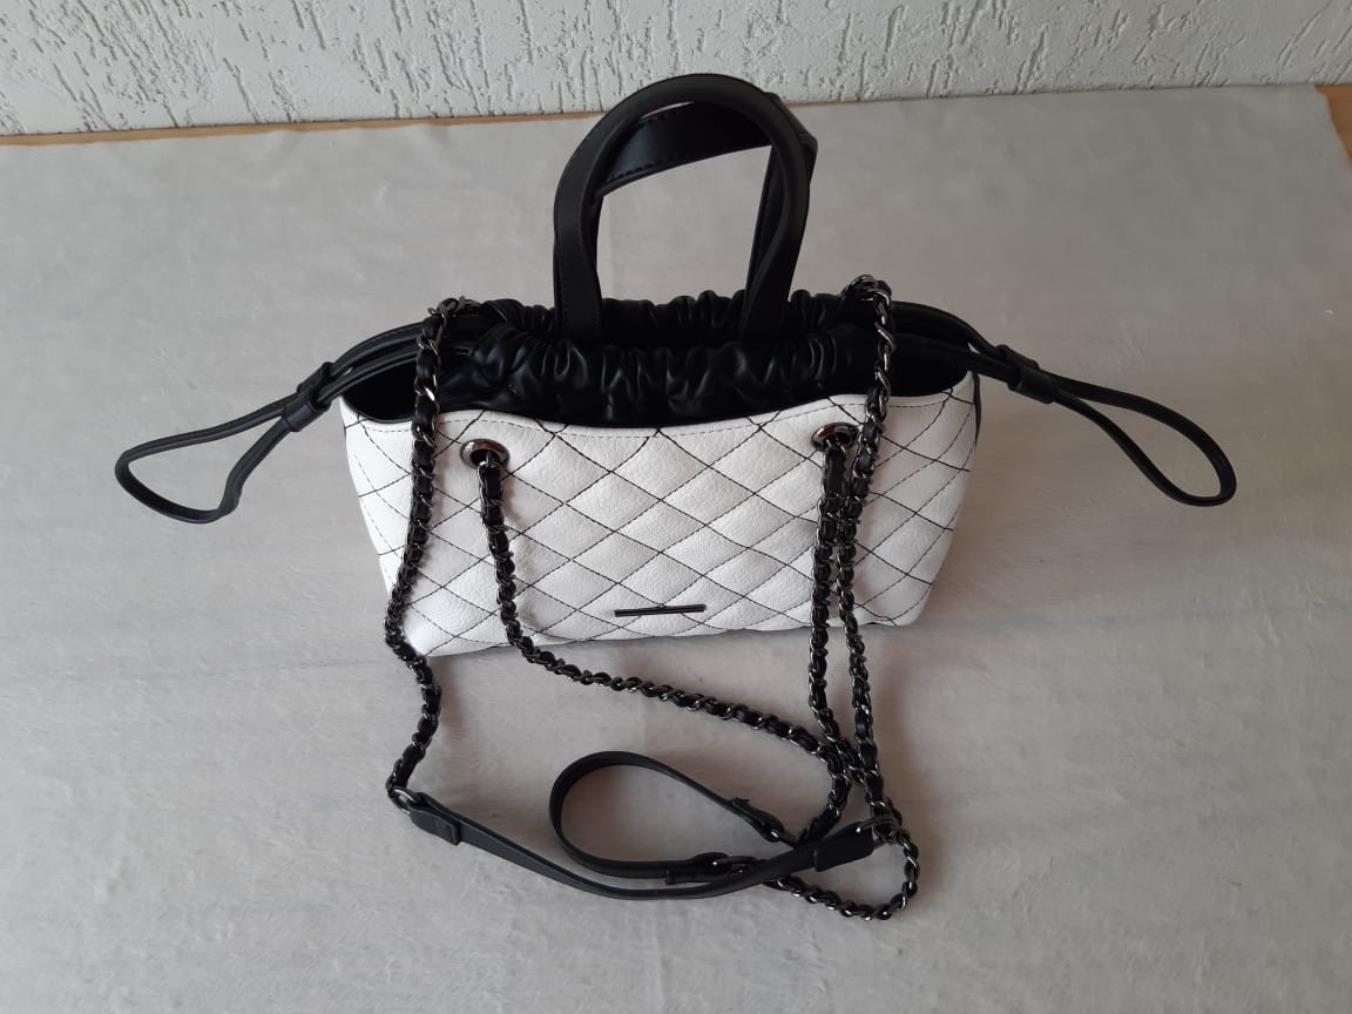 Bolsa com alça transversal